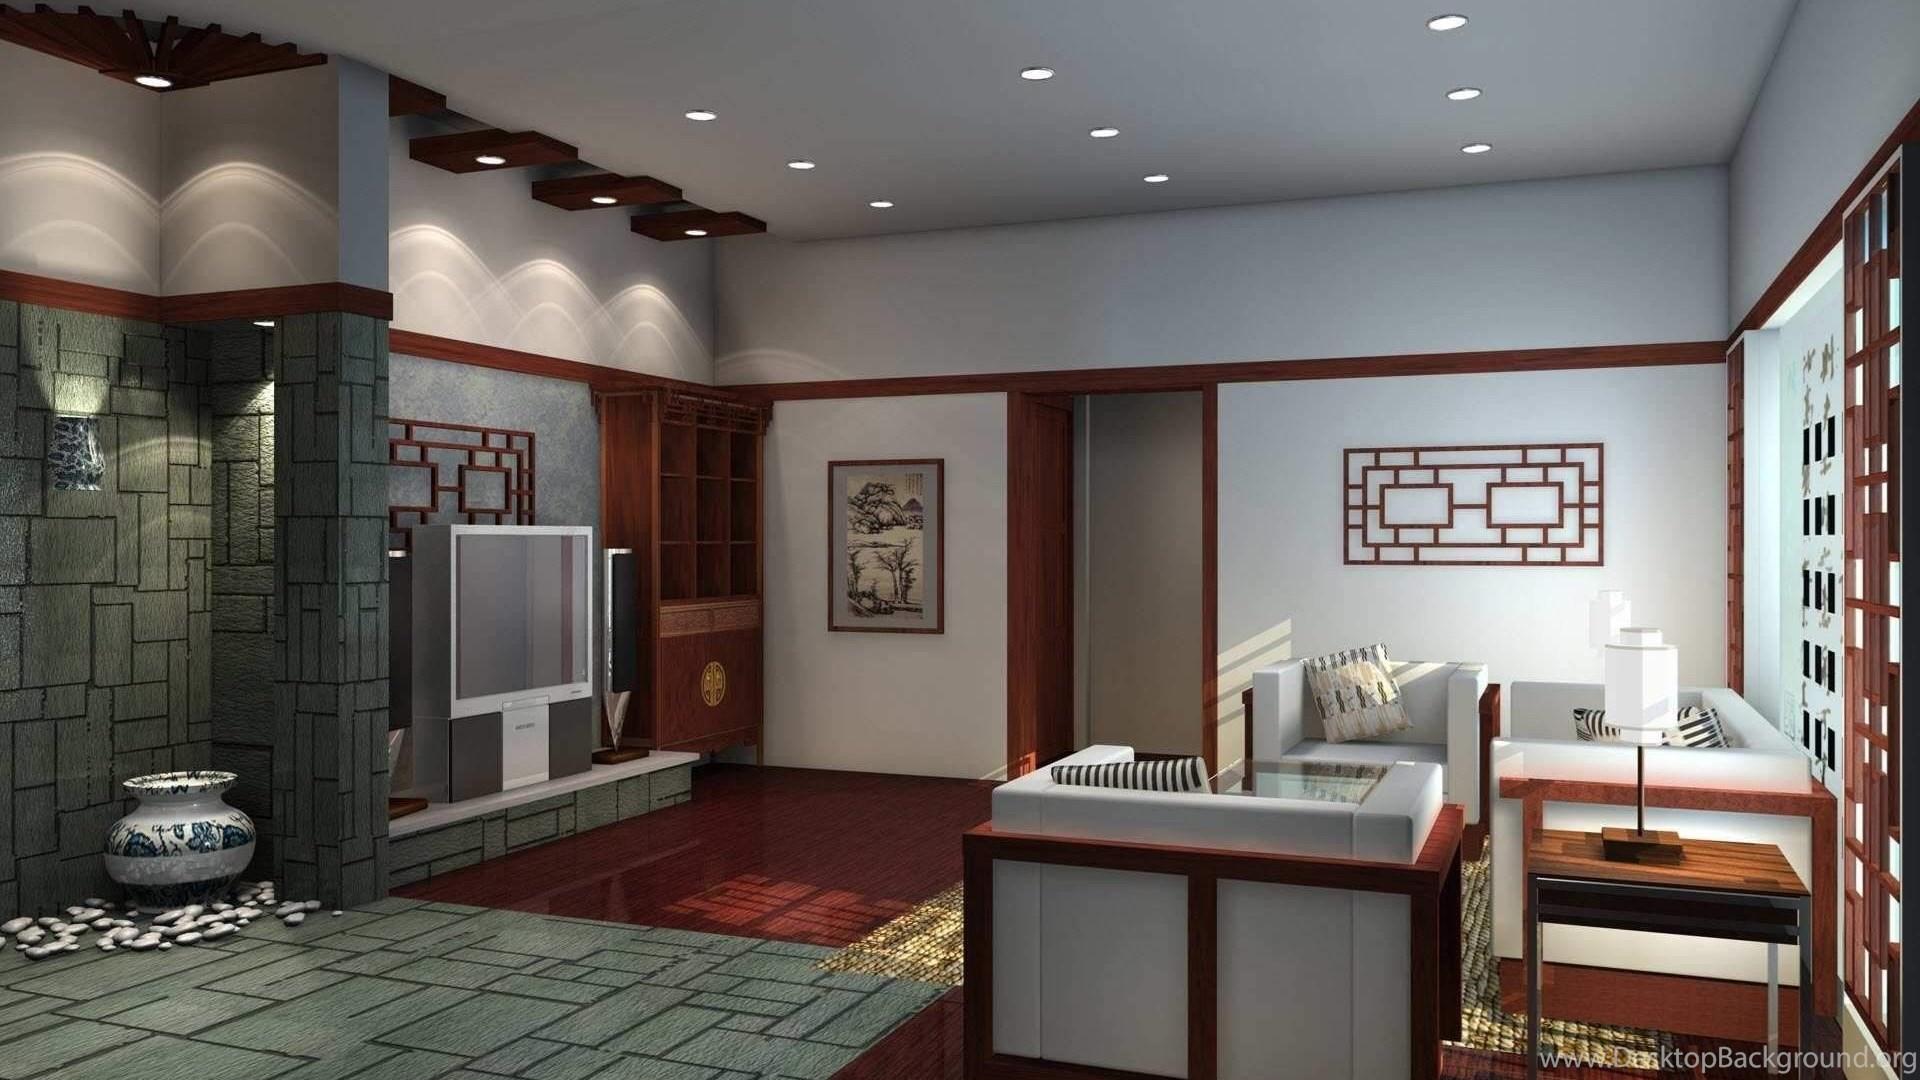 Royal Home Interior Design Wallpapers New HD Wallpapers Desktop ...